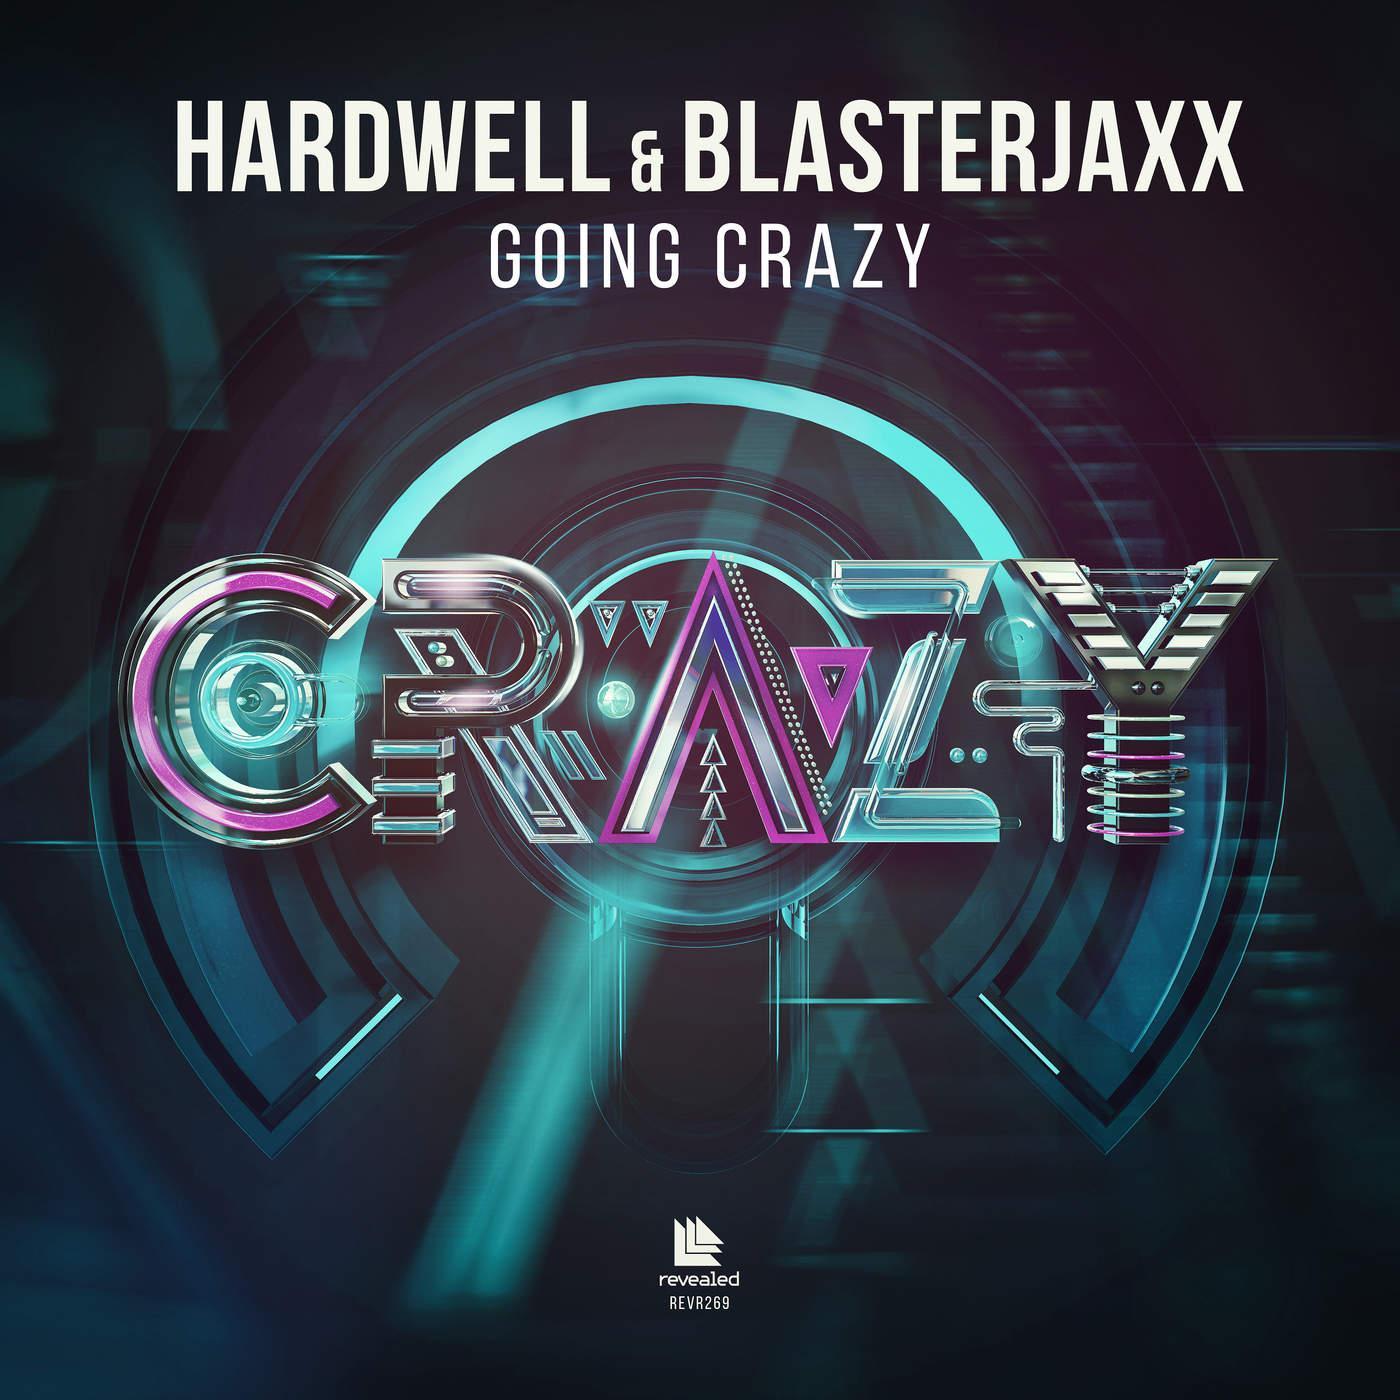 Hardwell & BlasterJaxx - Going Crazy - Single Cover